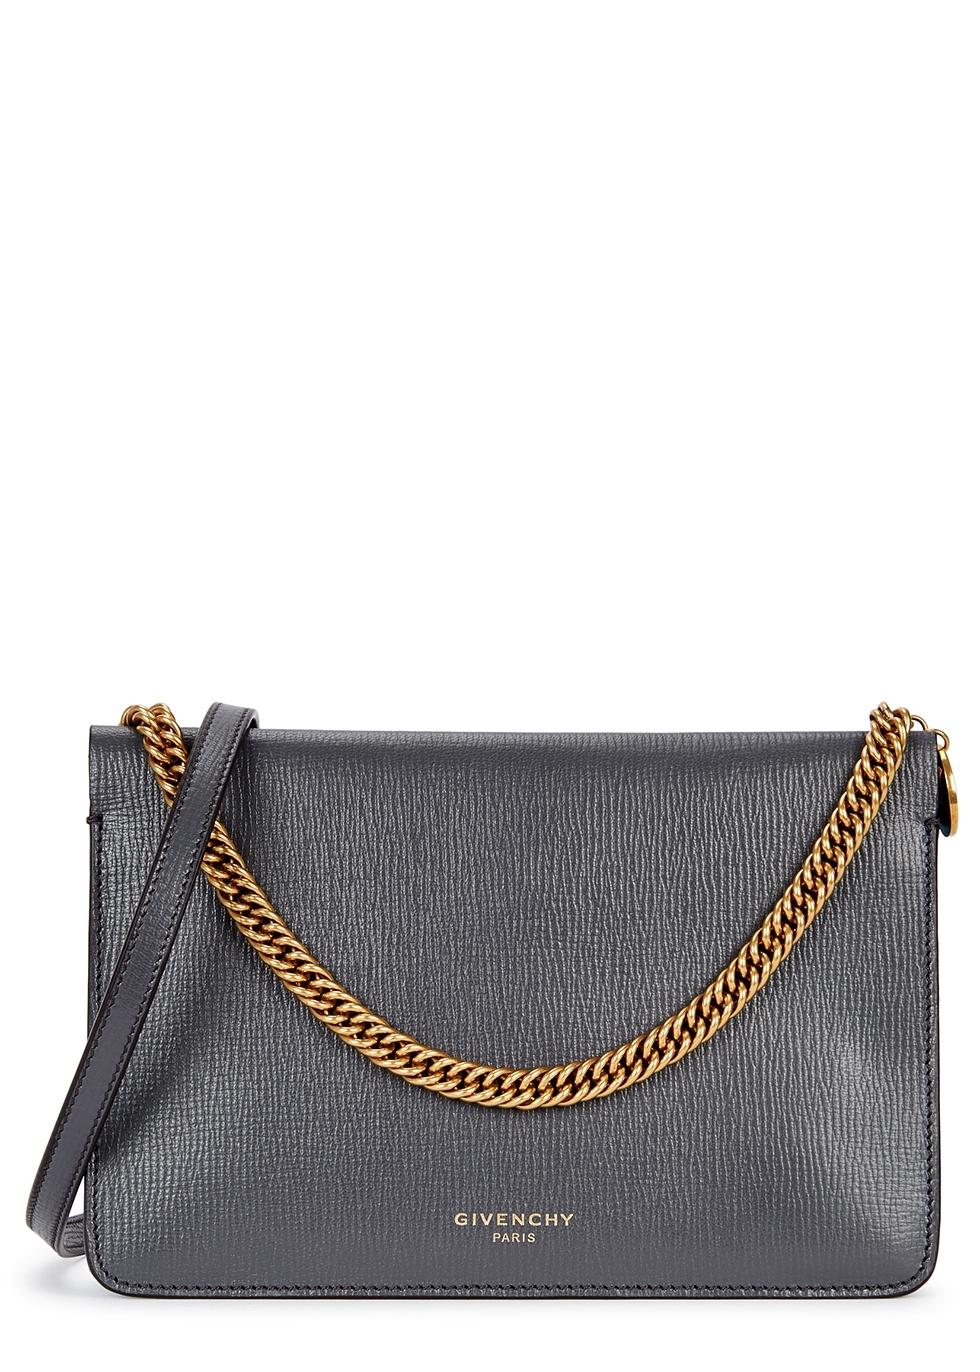 1e7848389 Women's Designer Bags, Handbags and Purses - Harvey Nichols